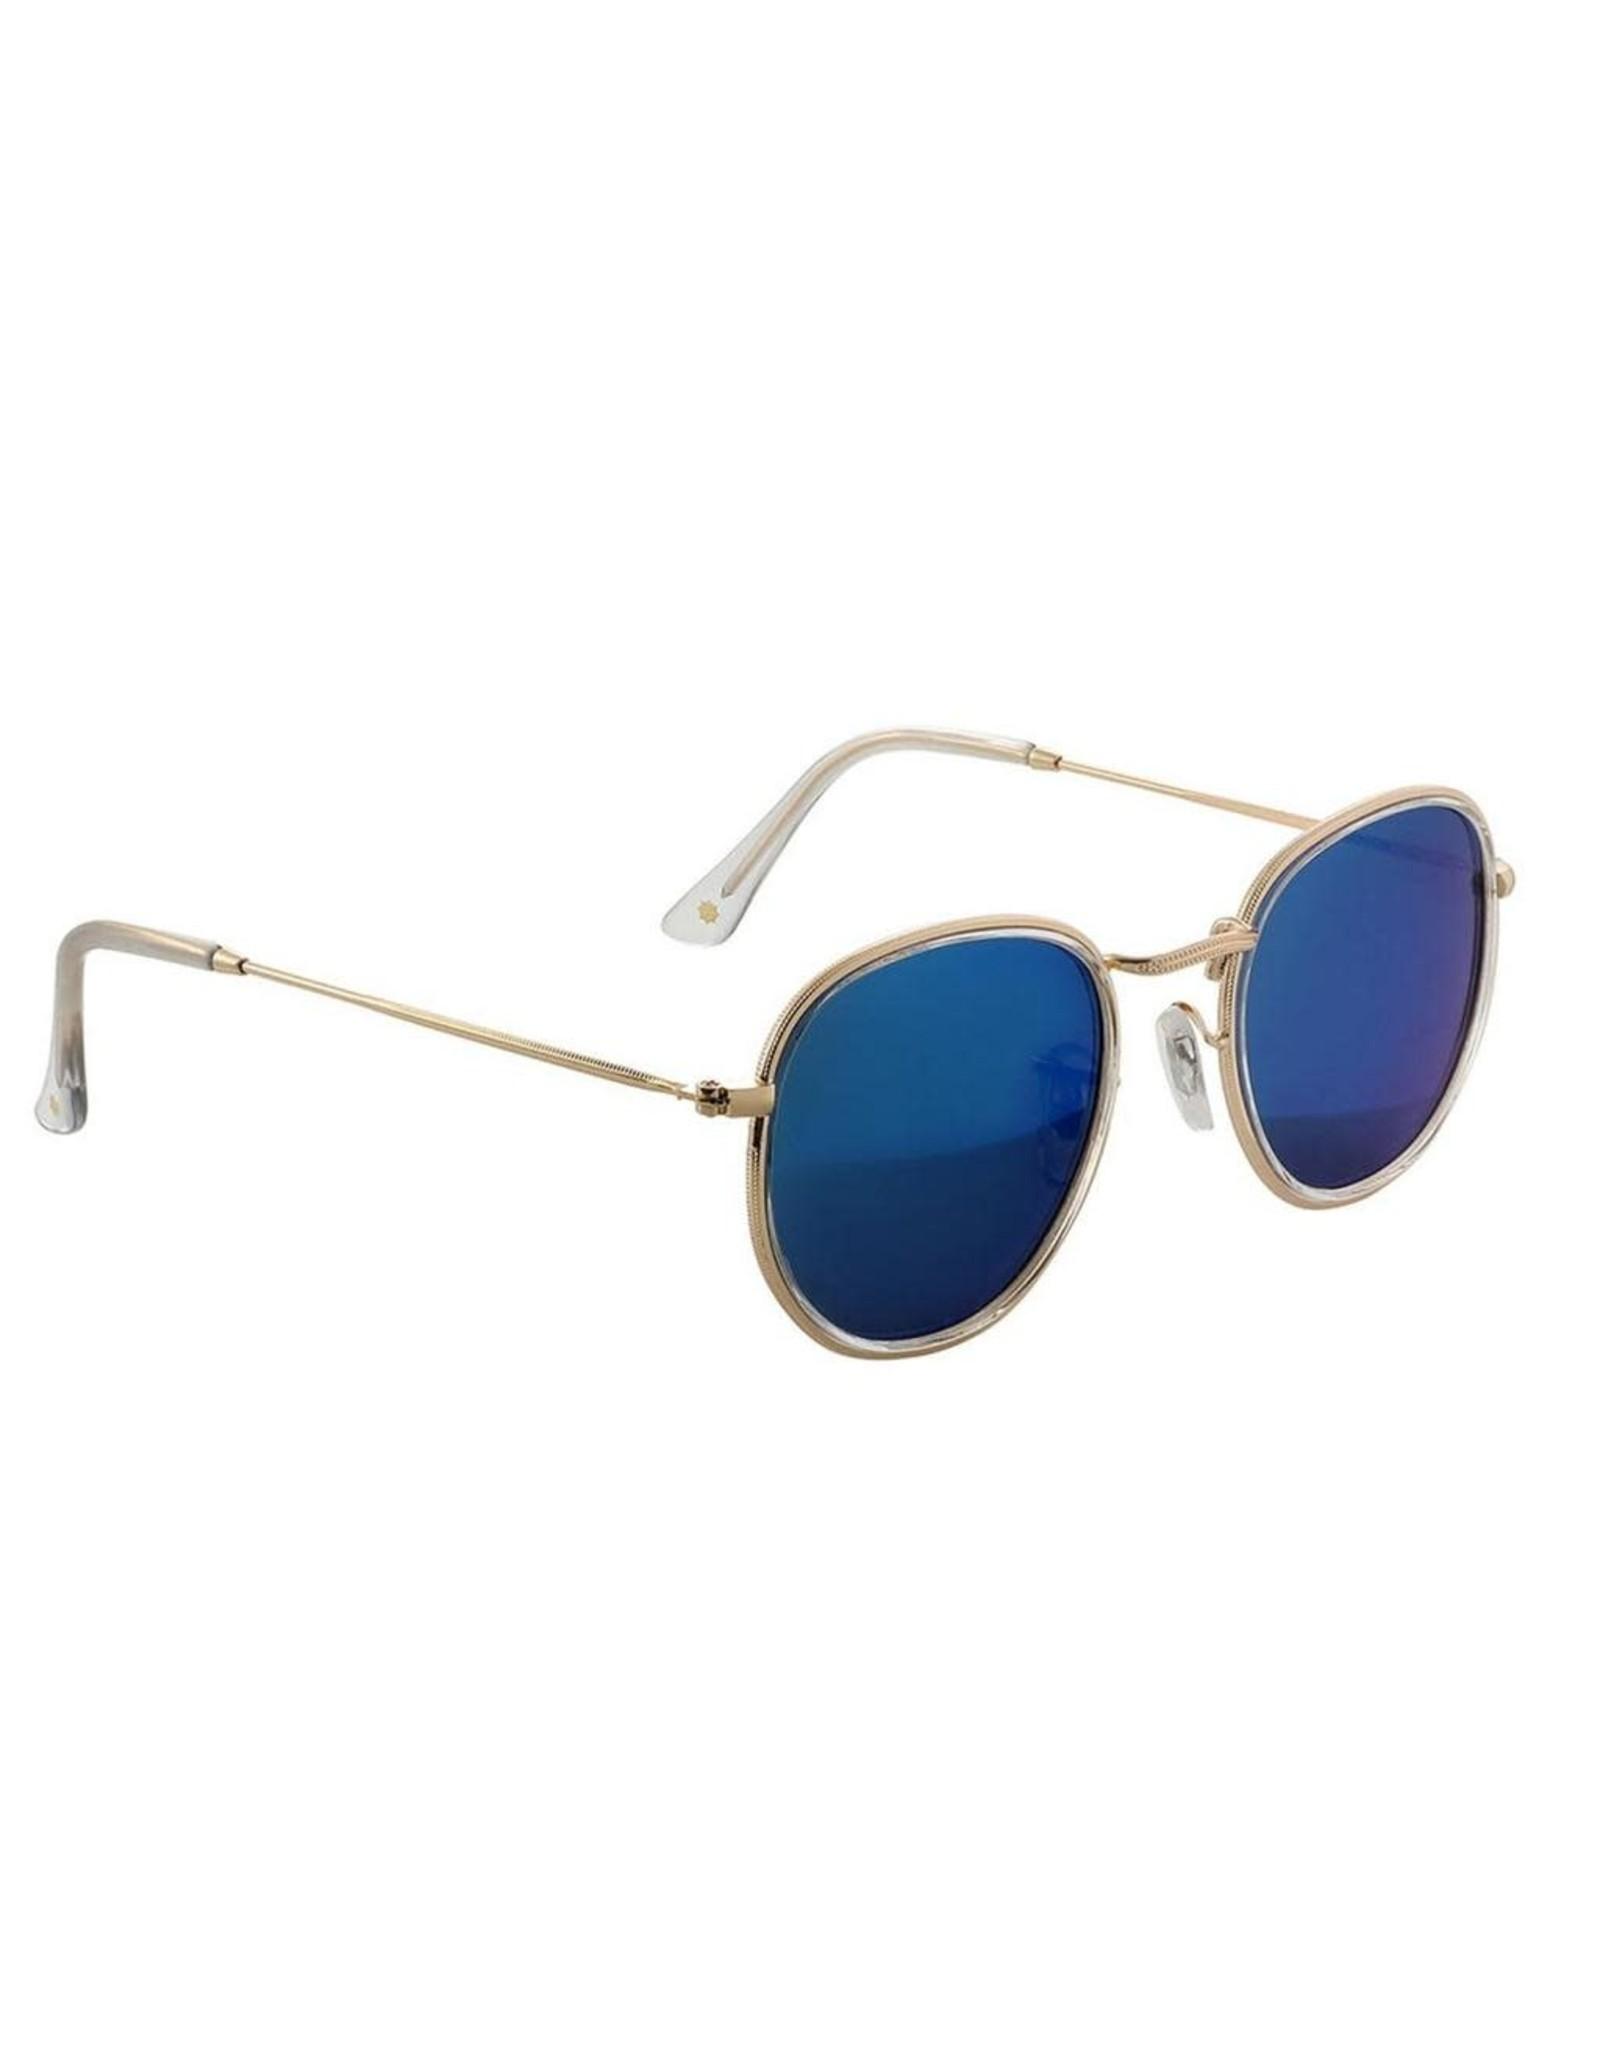 Glassy - Lunette soleil homme hudson polarized clear/blue mirror